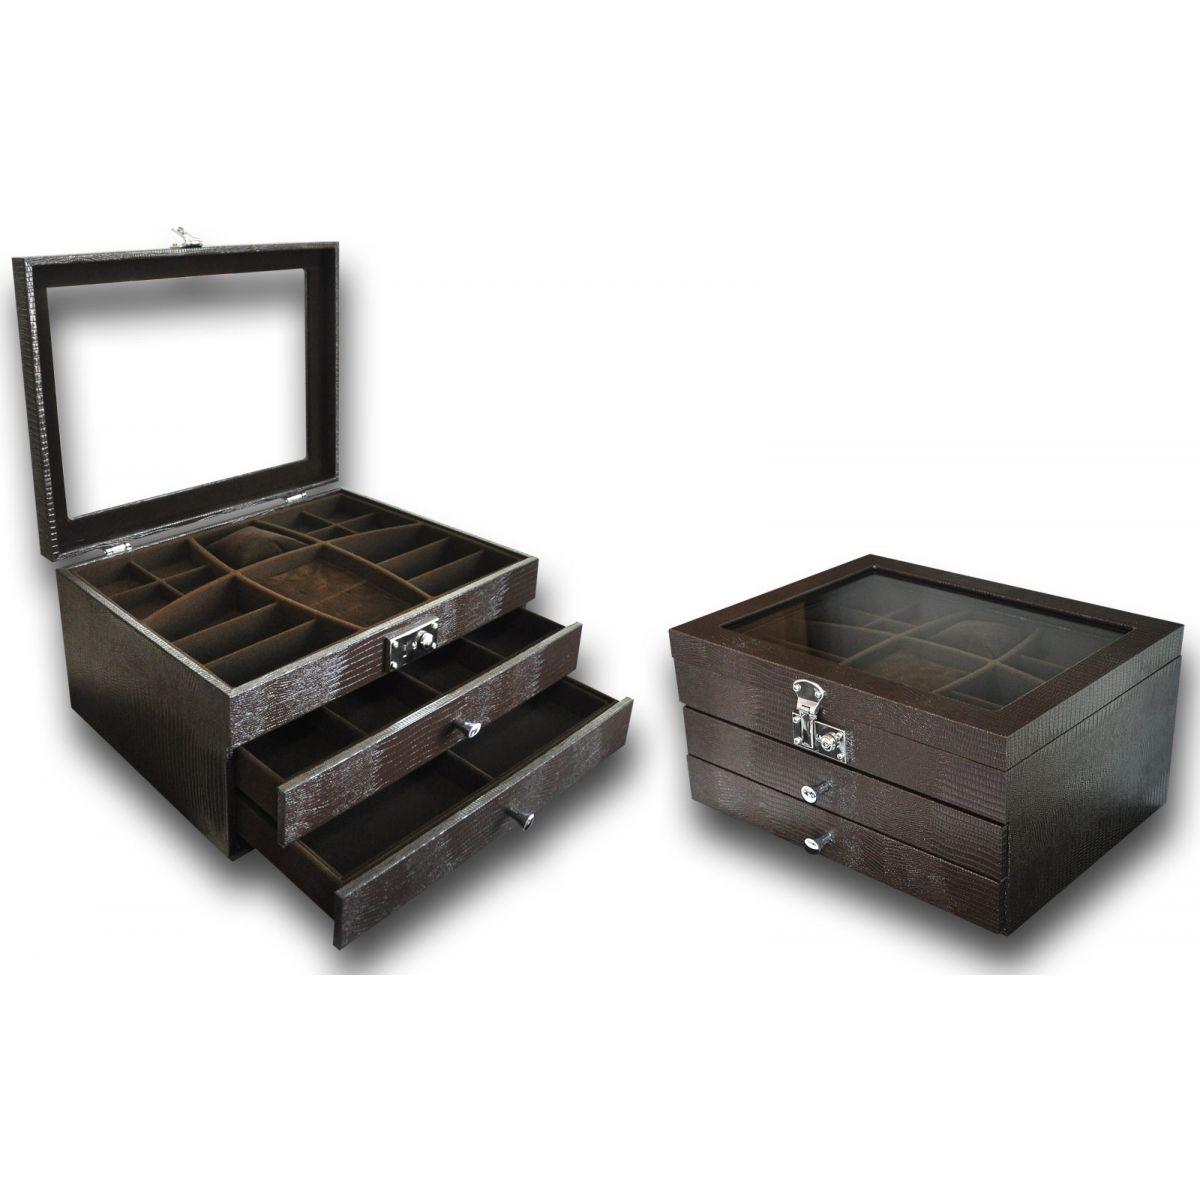 Porta-Joias modelo Luxo triplo